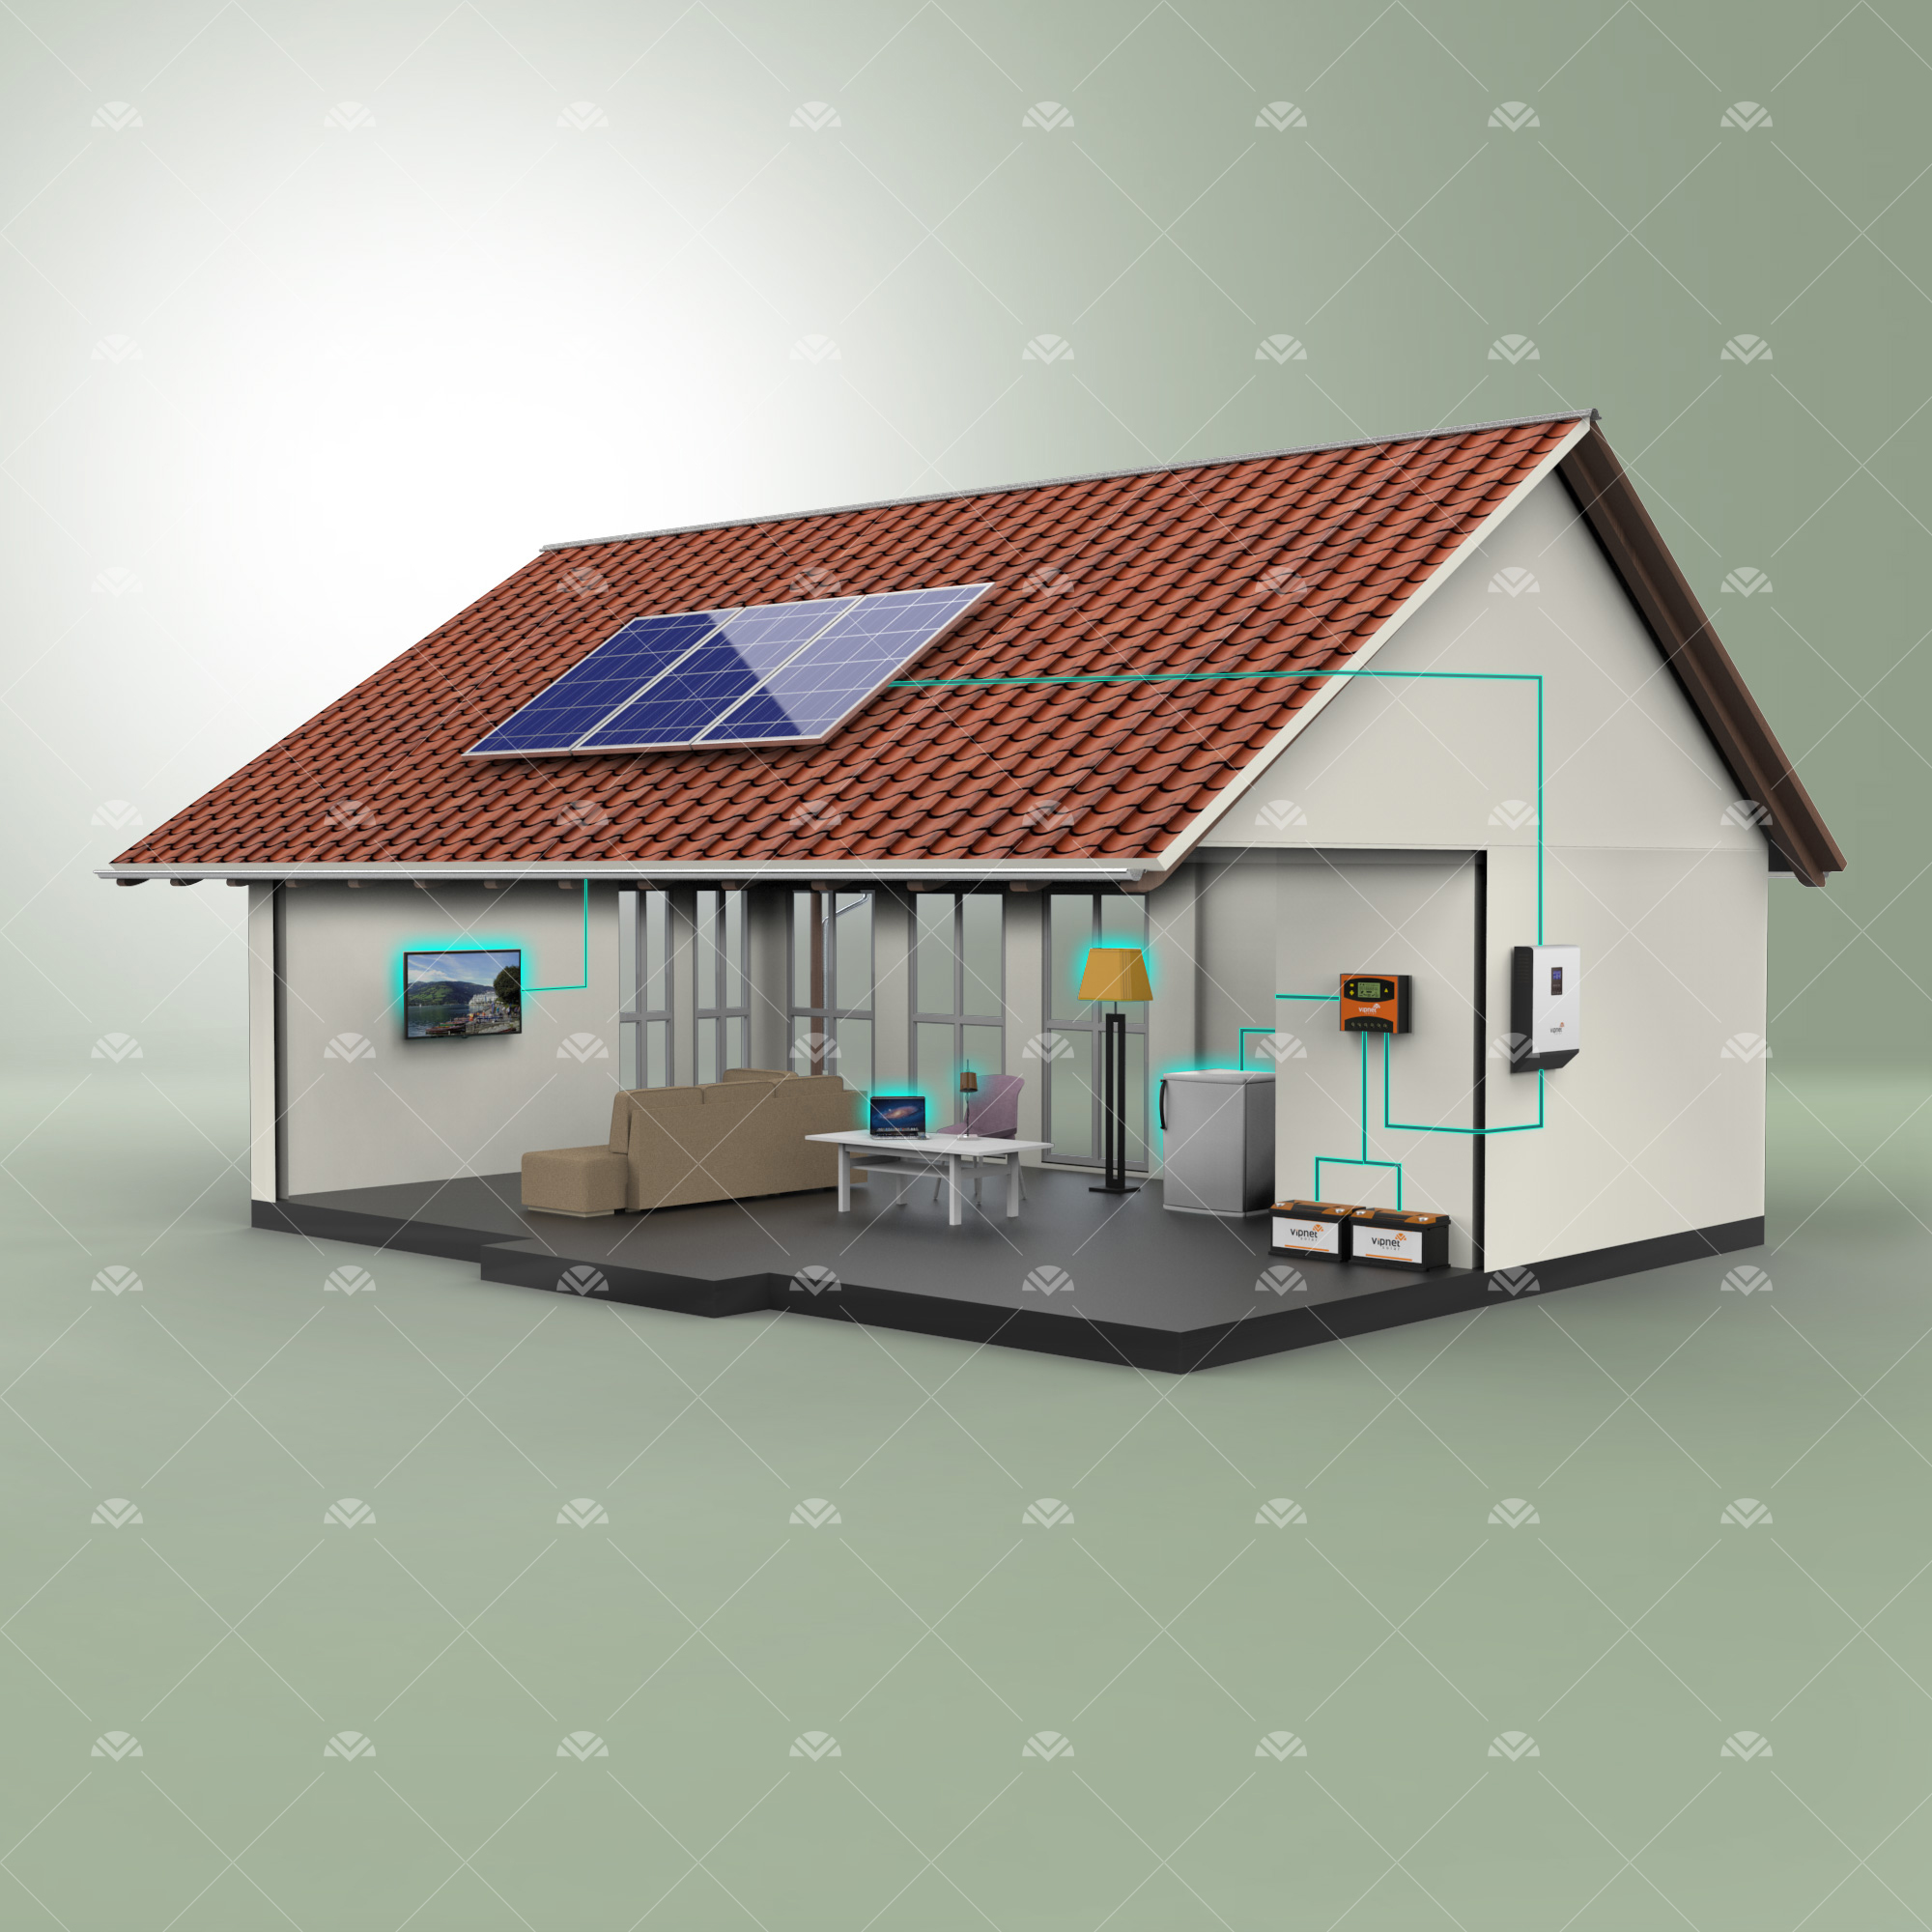 Solar Paket 1 - lamba, tv, mini buzdolabı, şarj cihazı